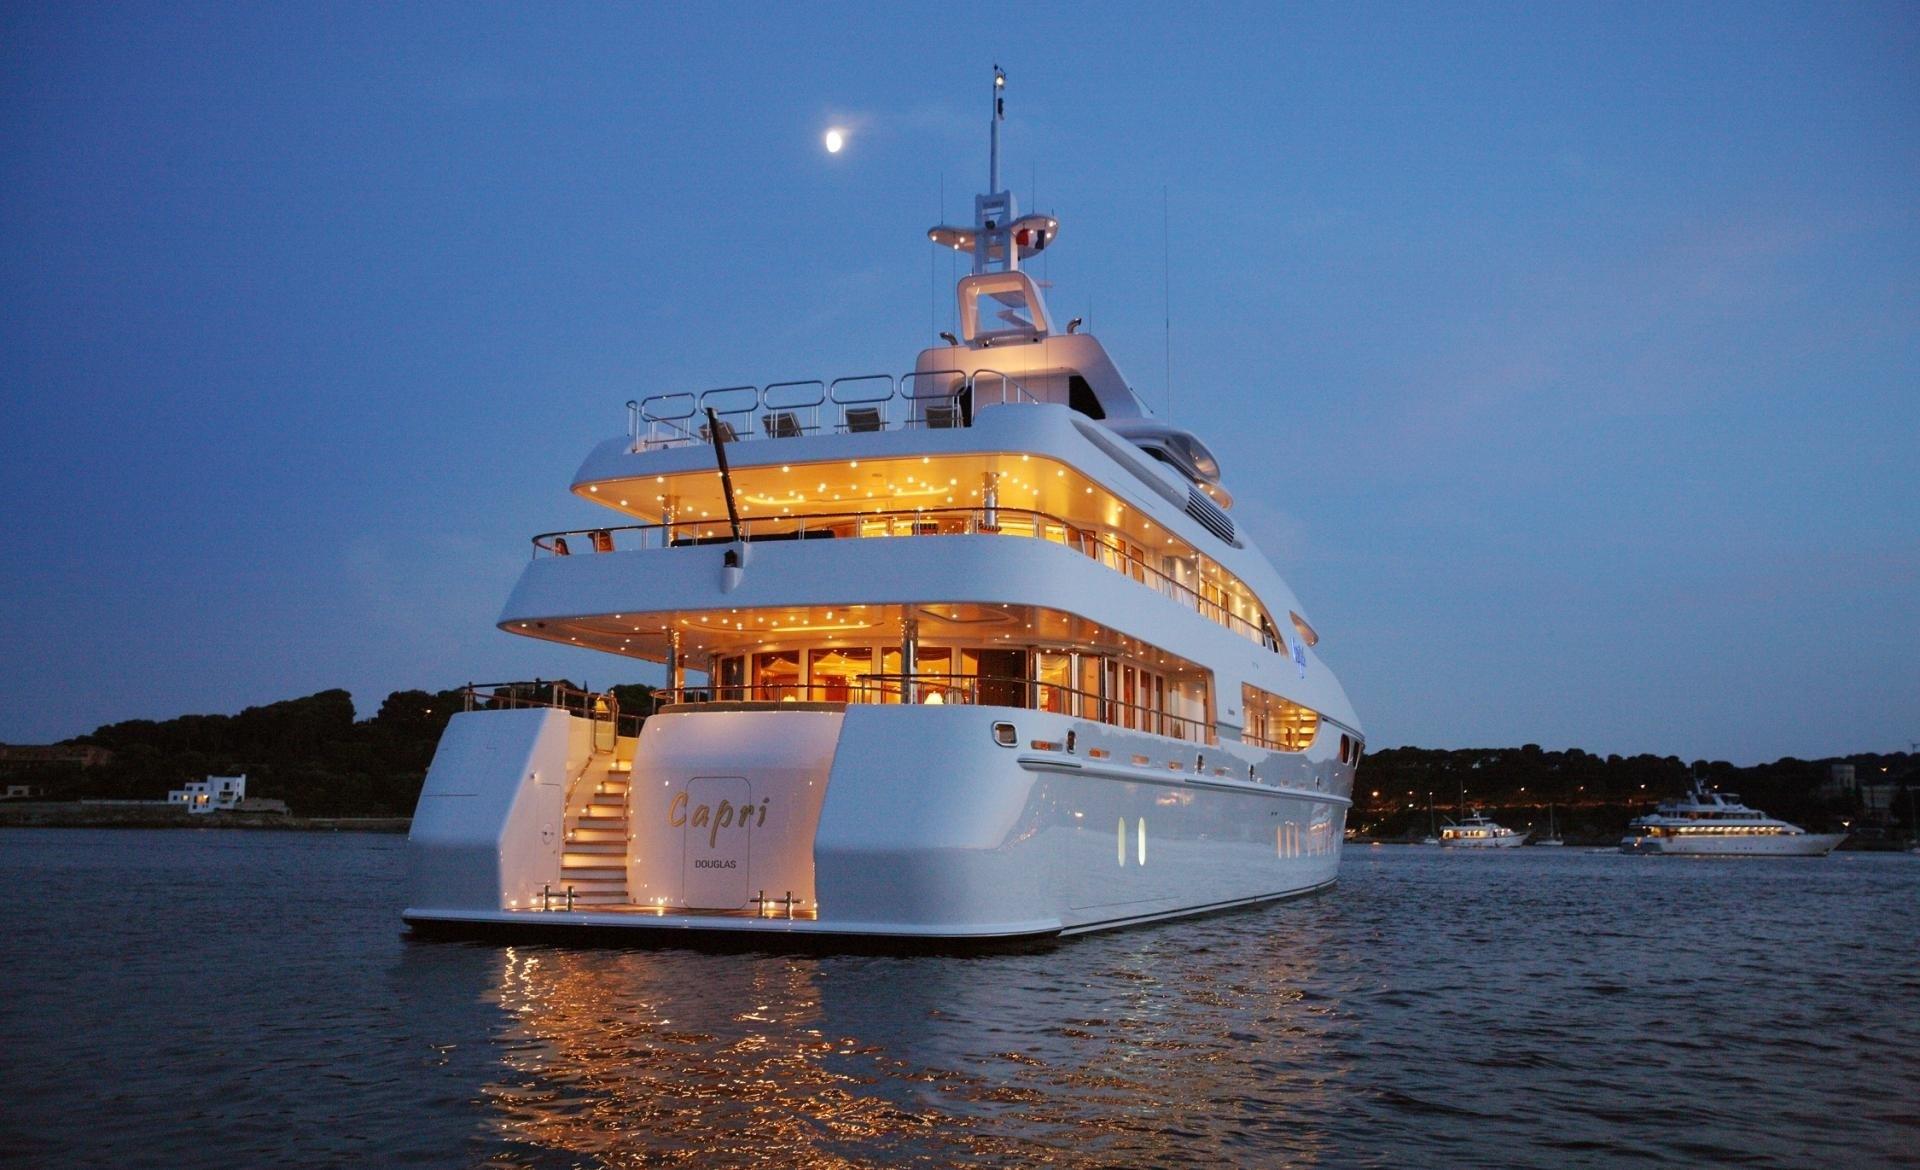 Evening: Yacht CAPRI's Aft Photograph